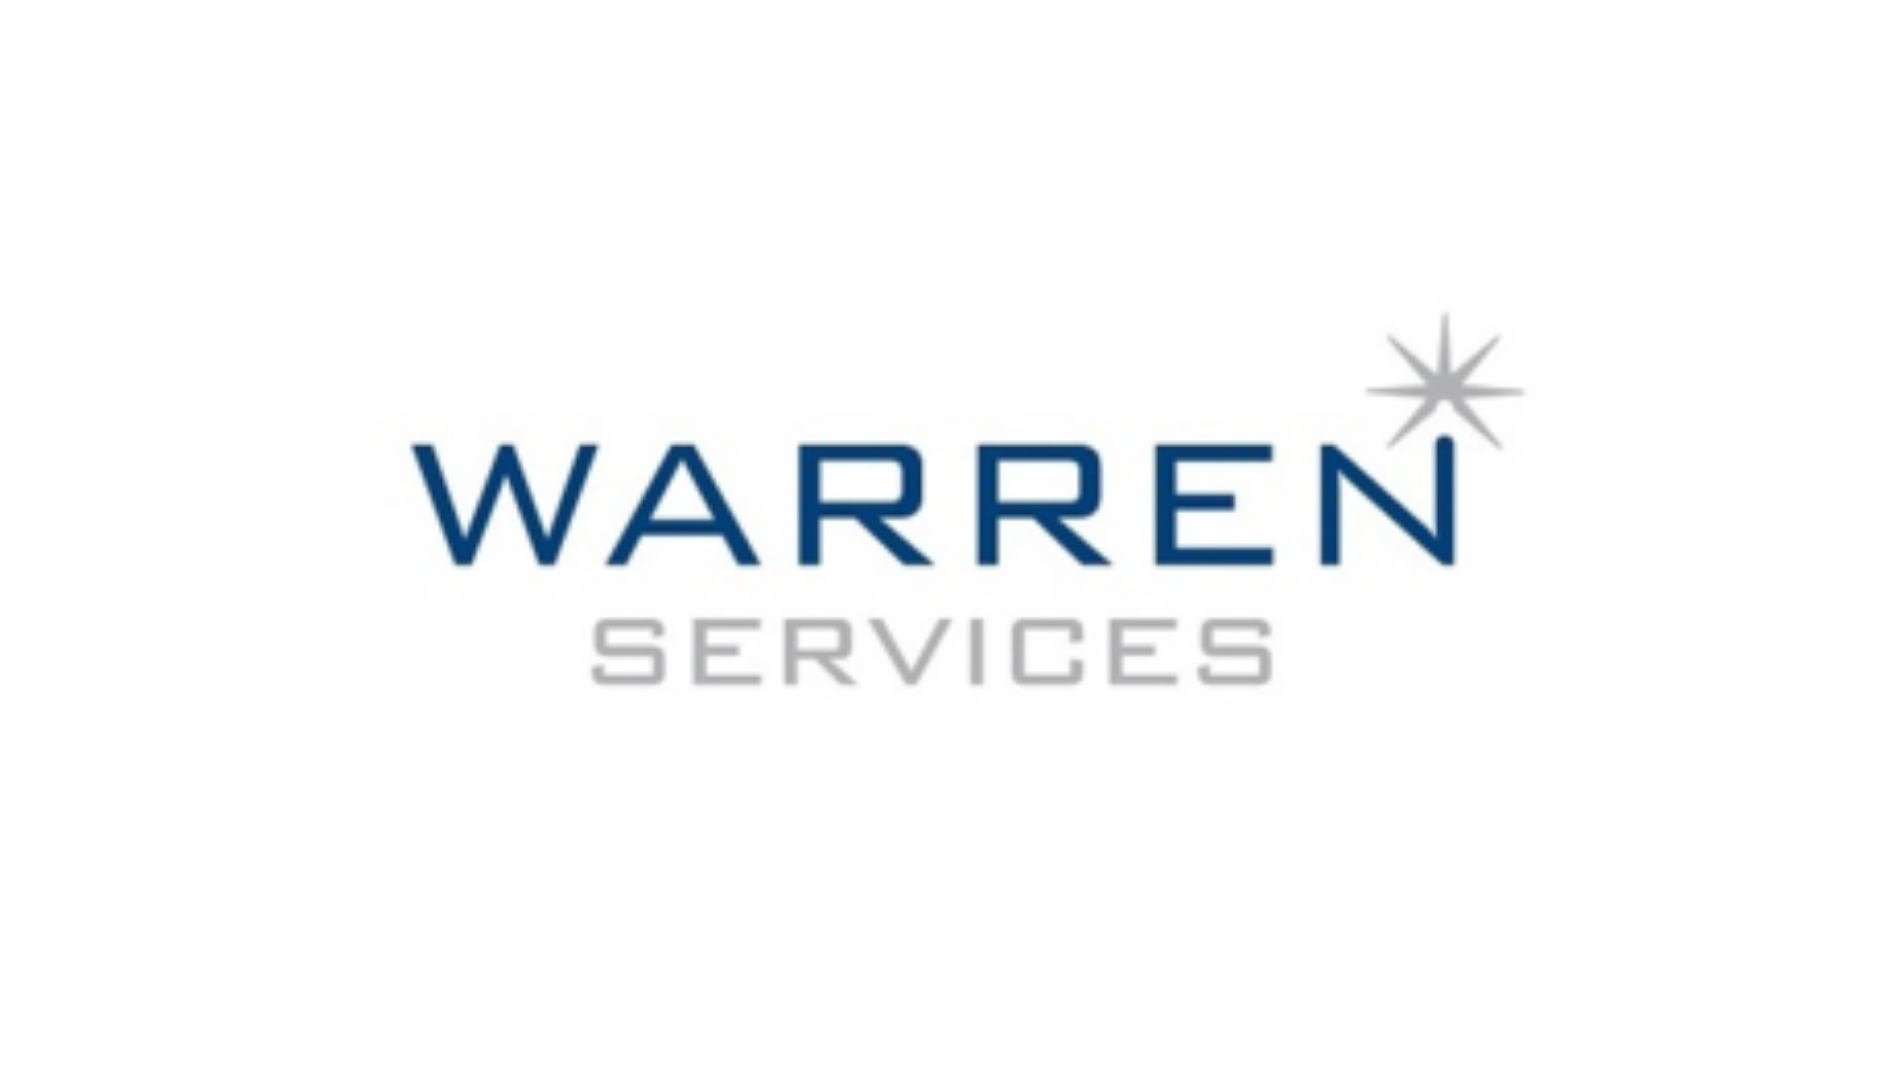 Warren Services' Story